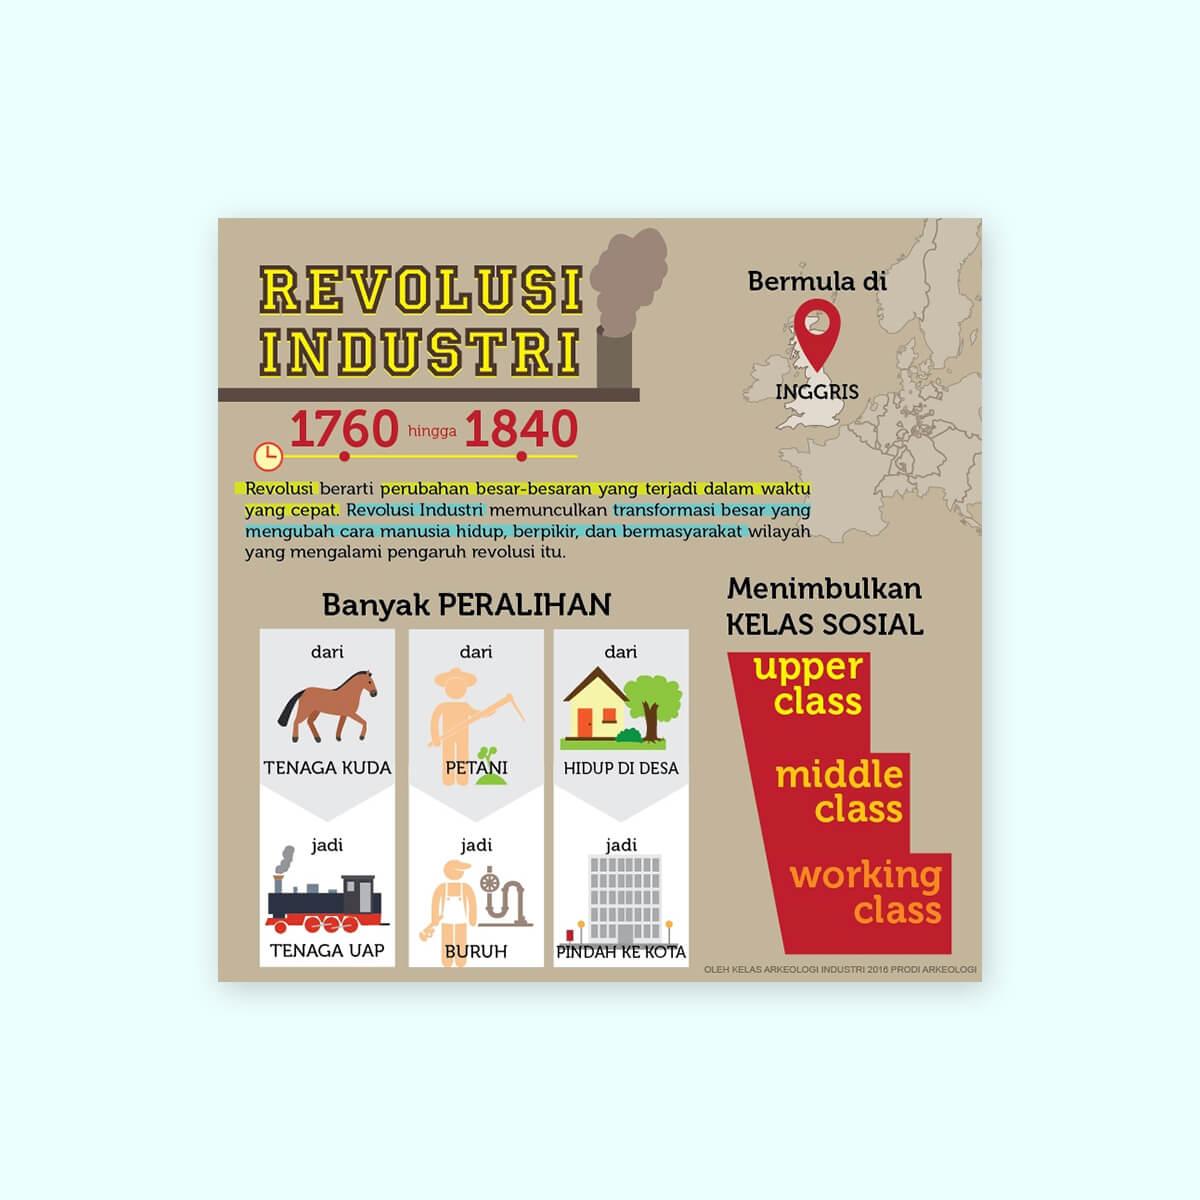 Desain Prita - Infografis revolusi industri